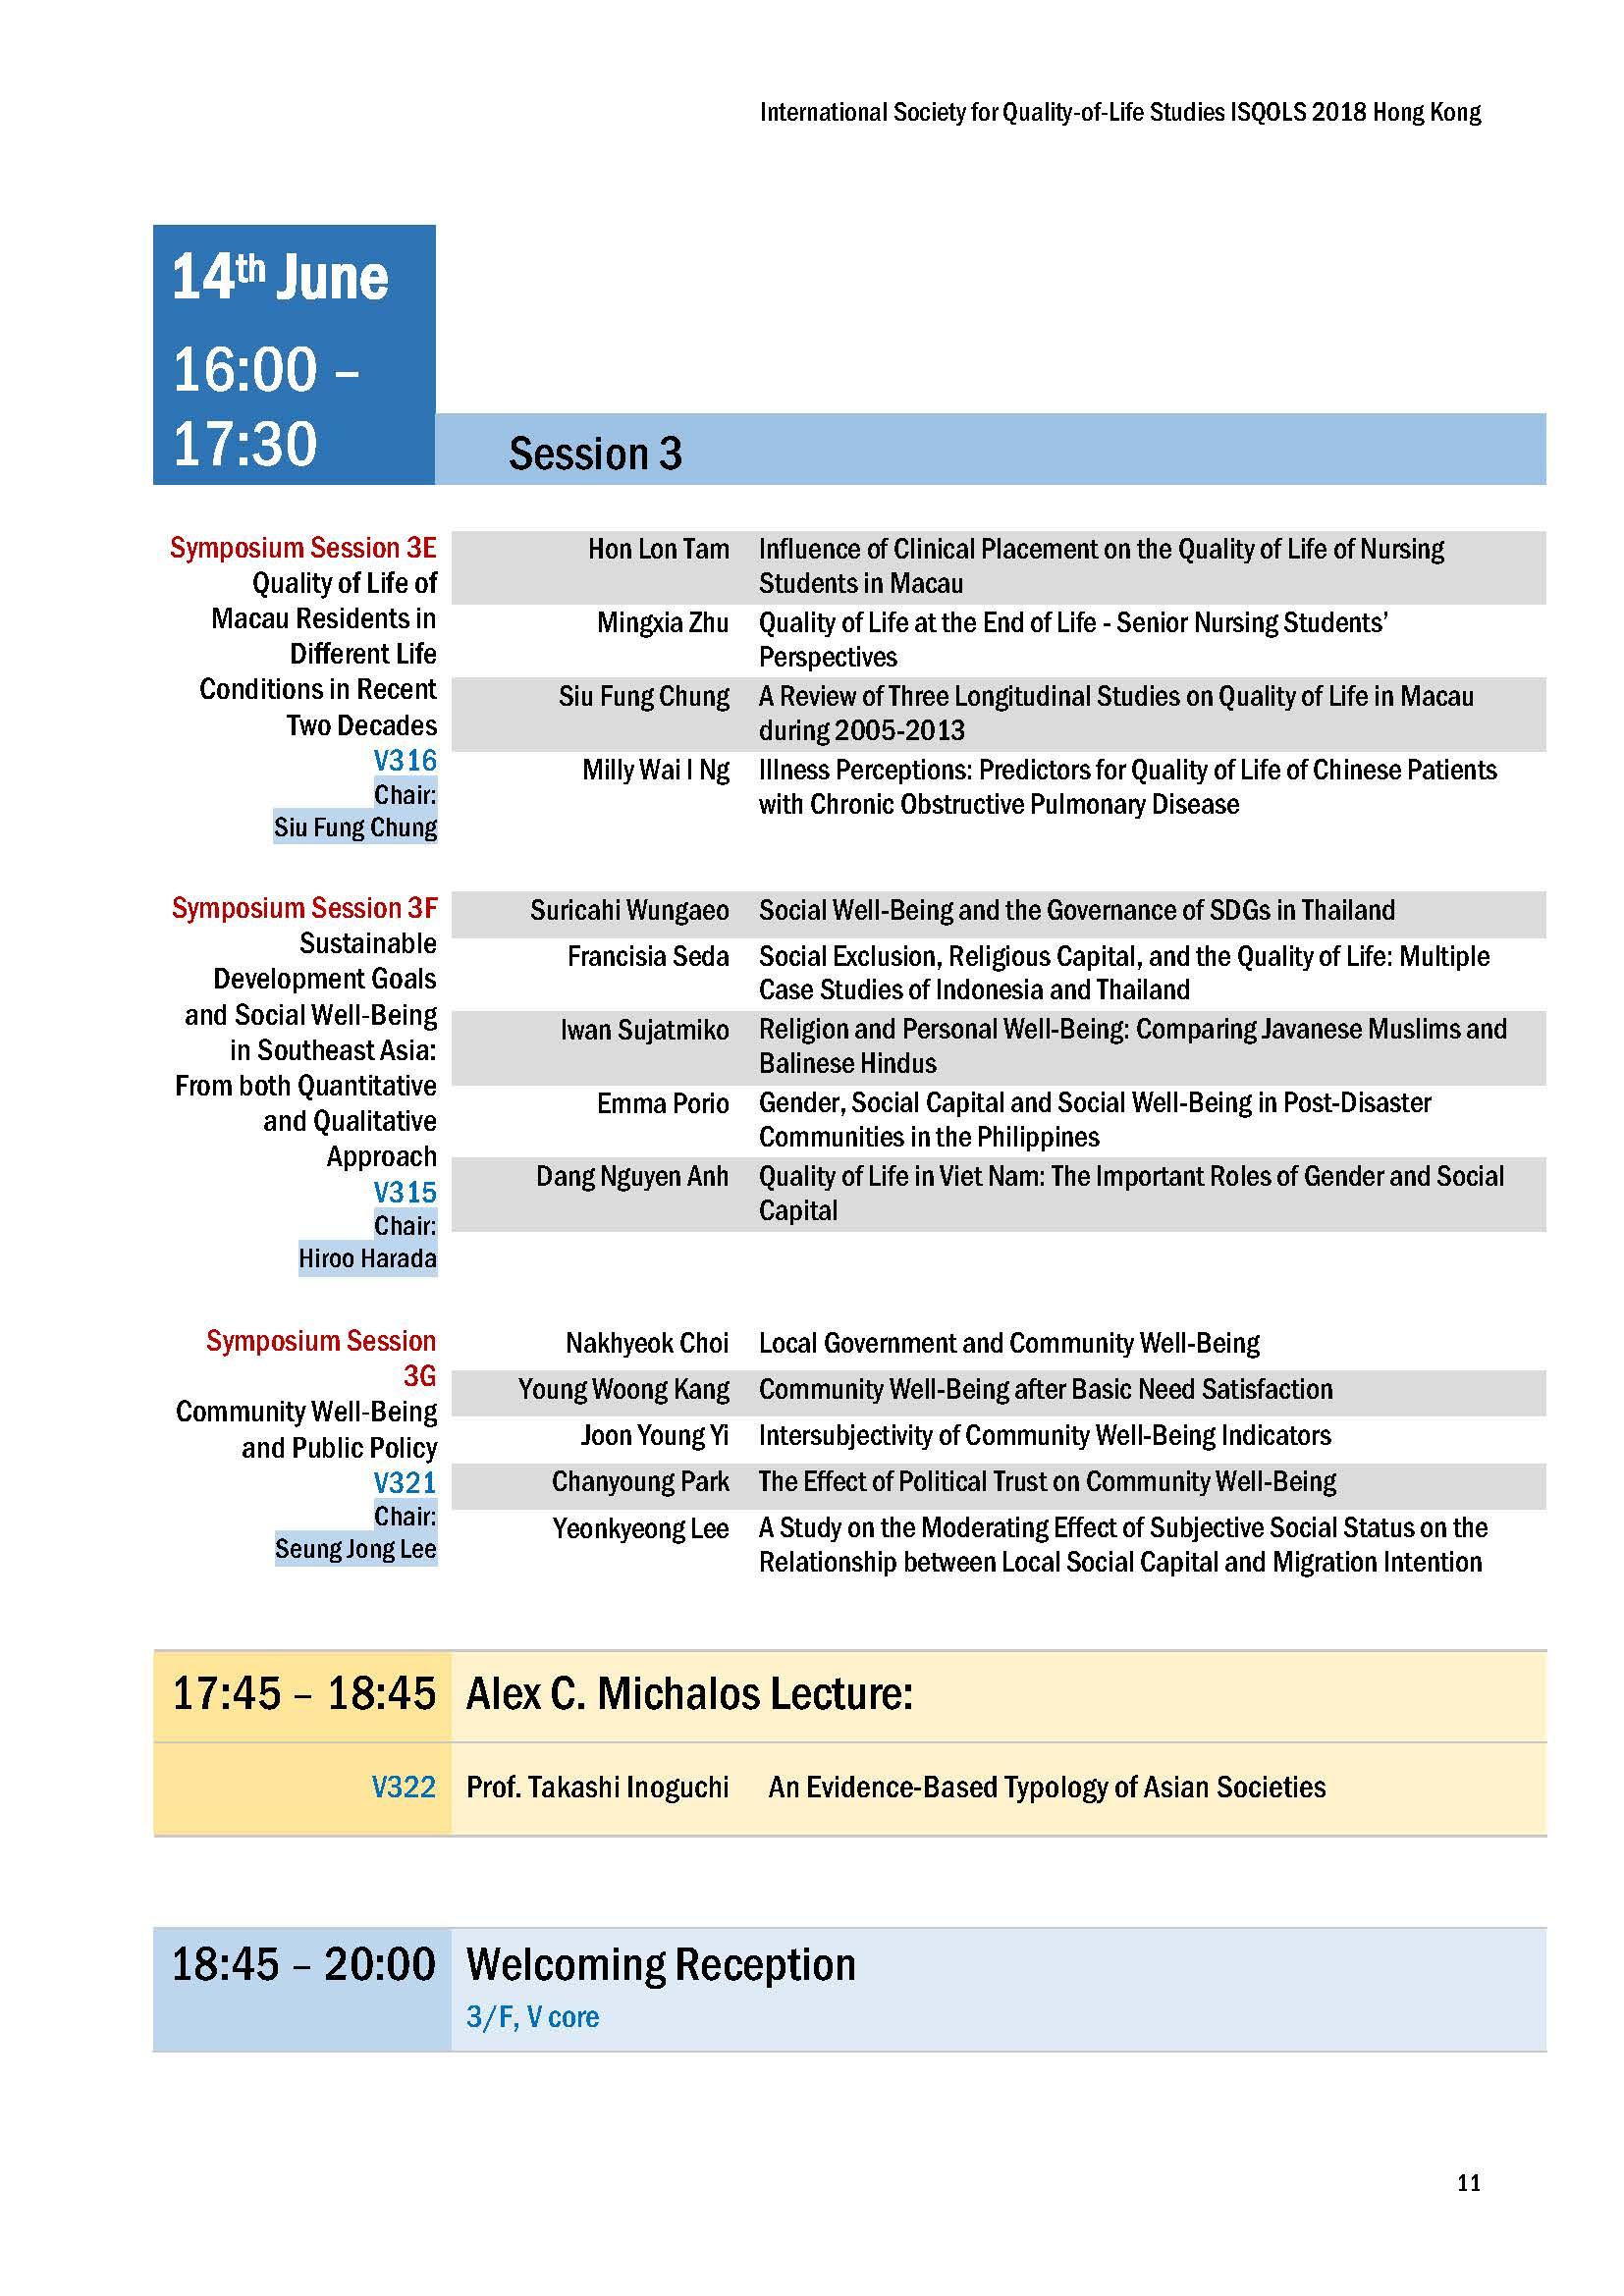 ISQOLS2018_E_Programme_Brief--커뮤니티웰빙연구센터 (1)_페이지_13